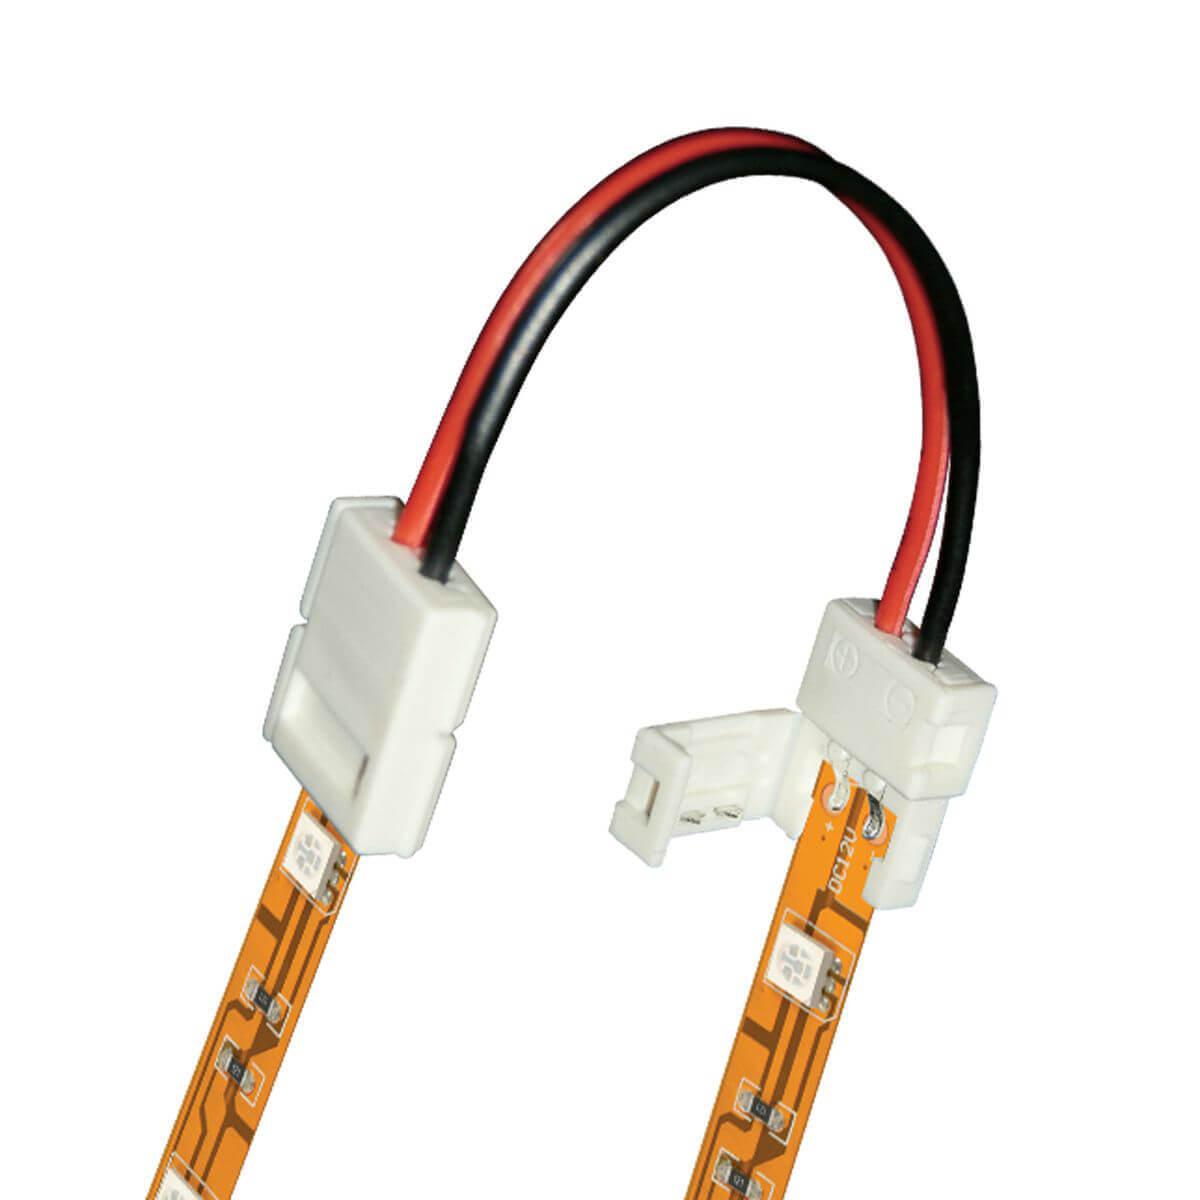 Коннектор для светодиодных лент (06612) Uniel UCX-SS2/B20-NNN White 020 цена и фото